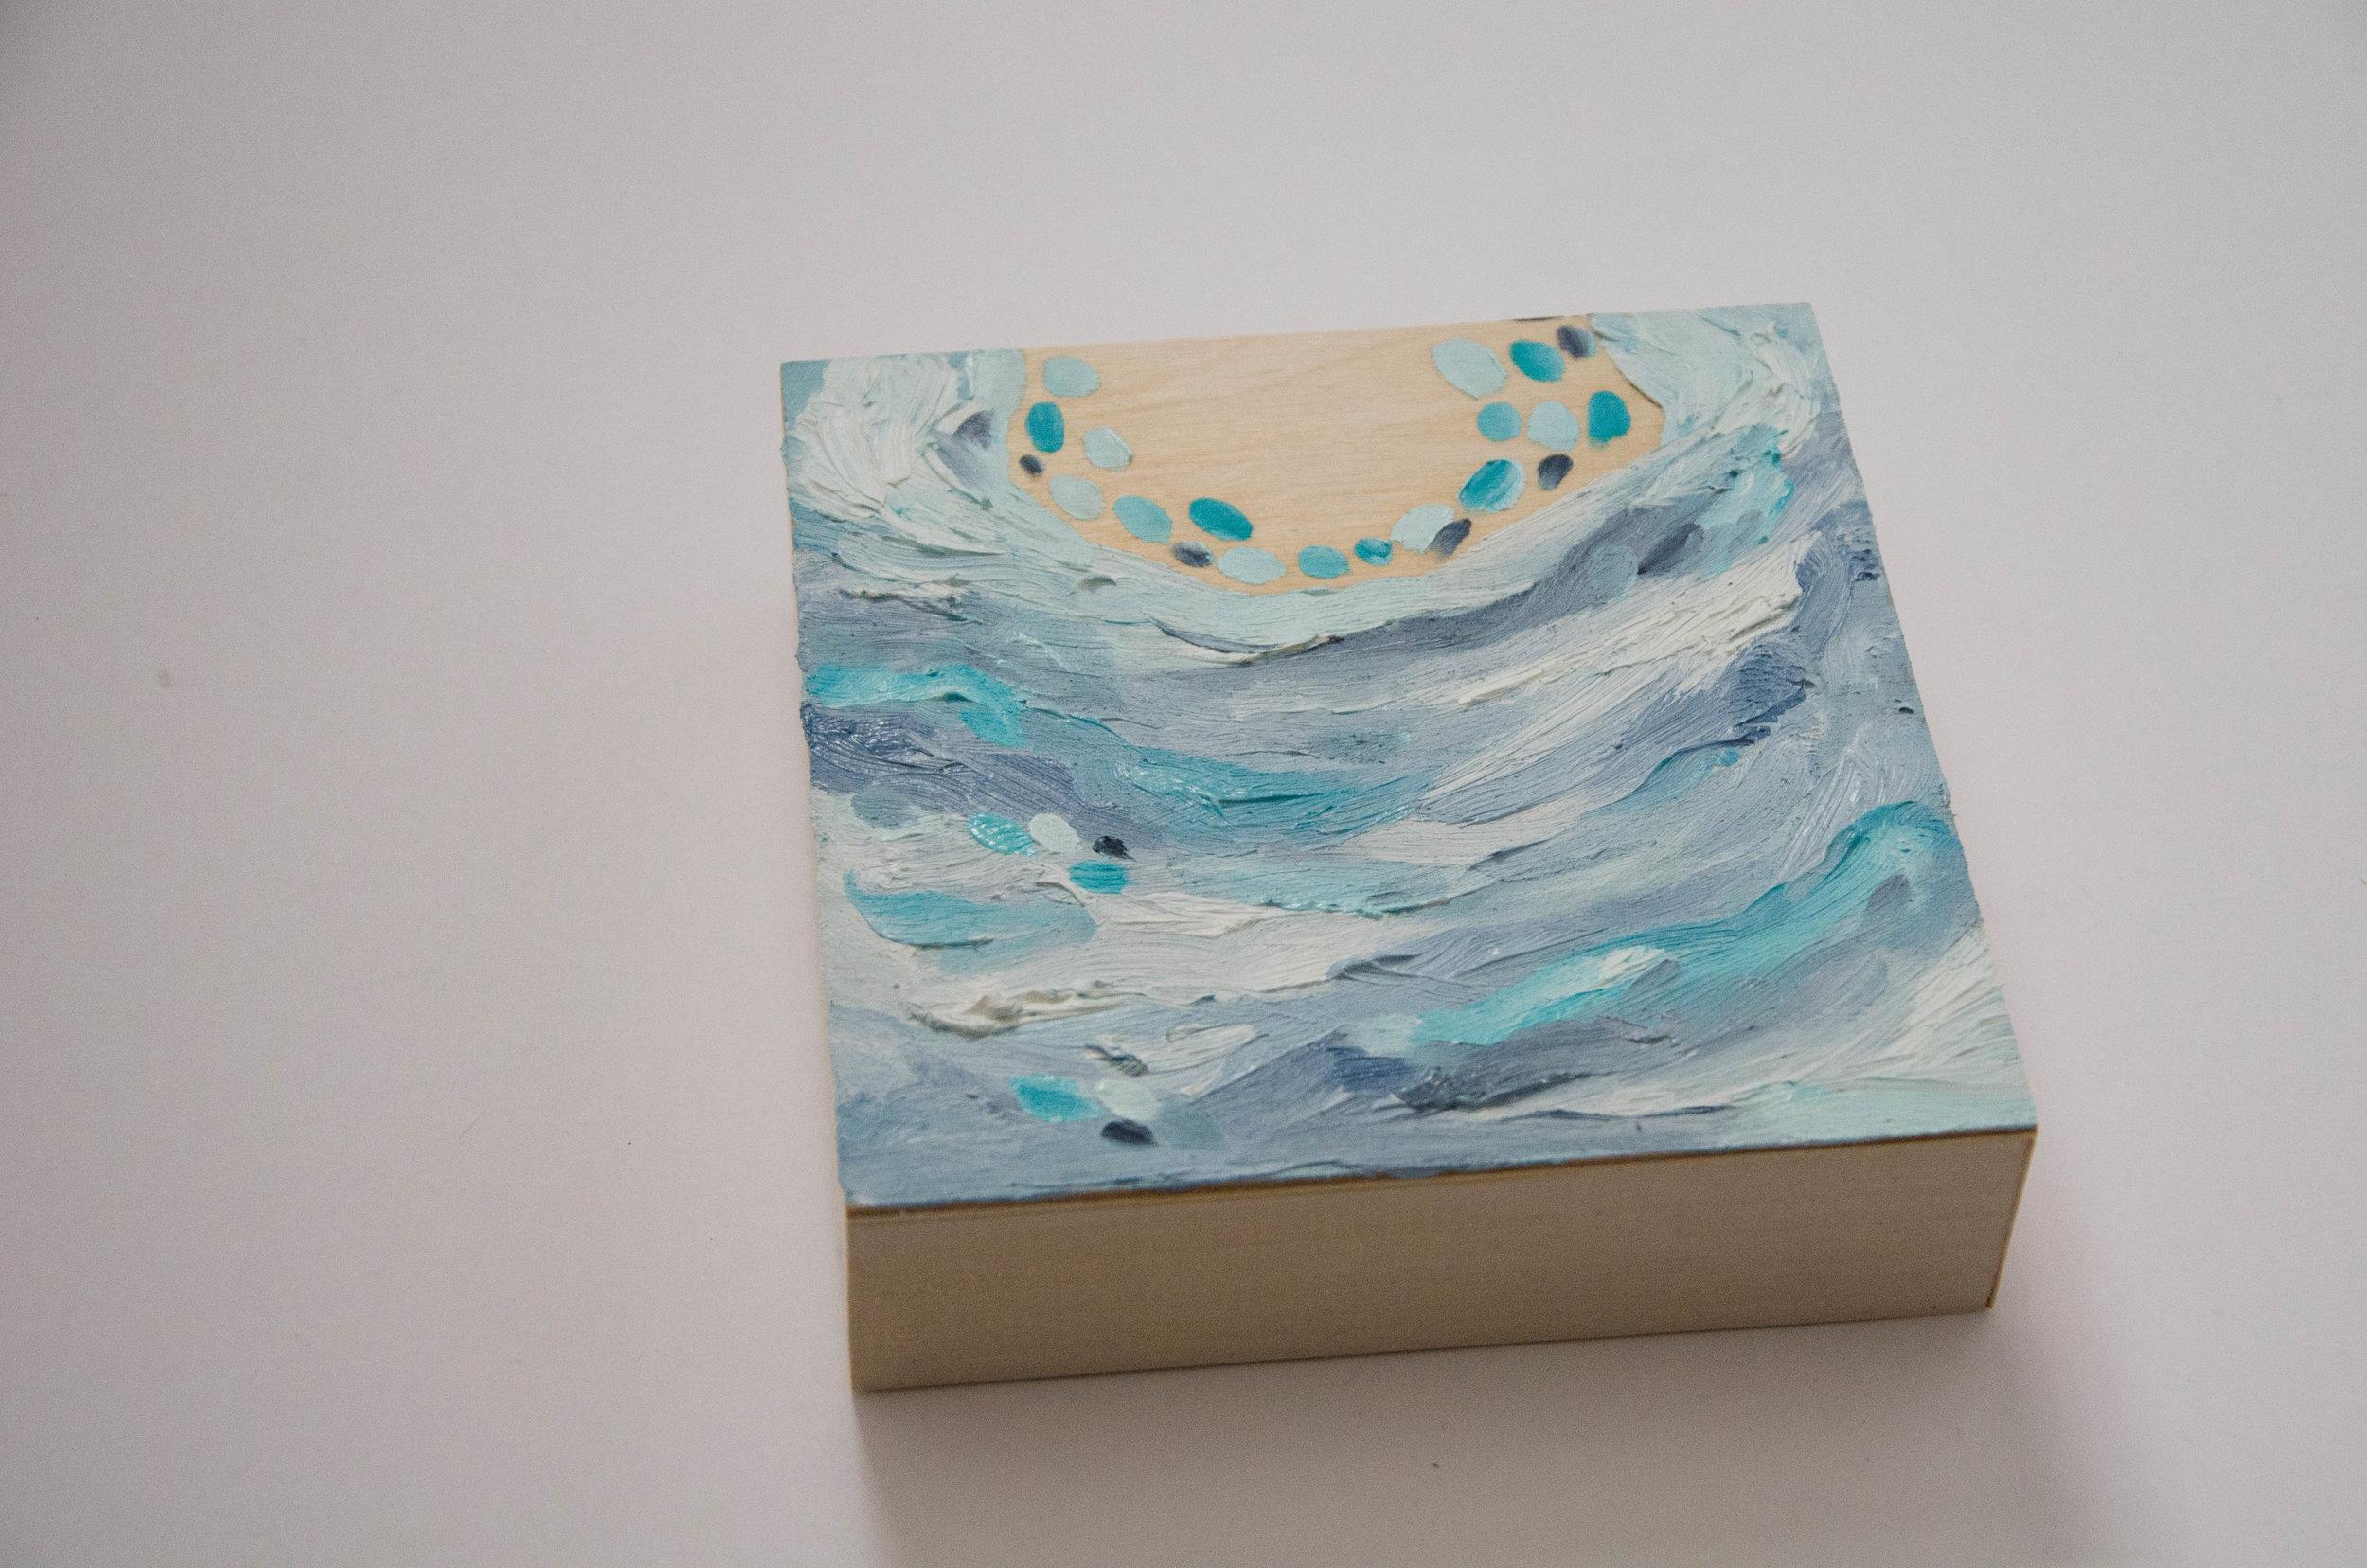 marysia-champ-canadian-prairie-landscape-artist-oil-painting-artwork-yyc-wood-panel